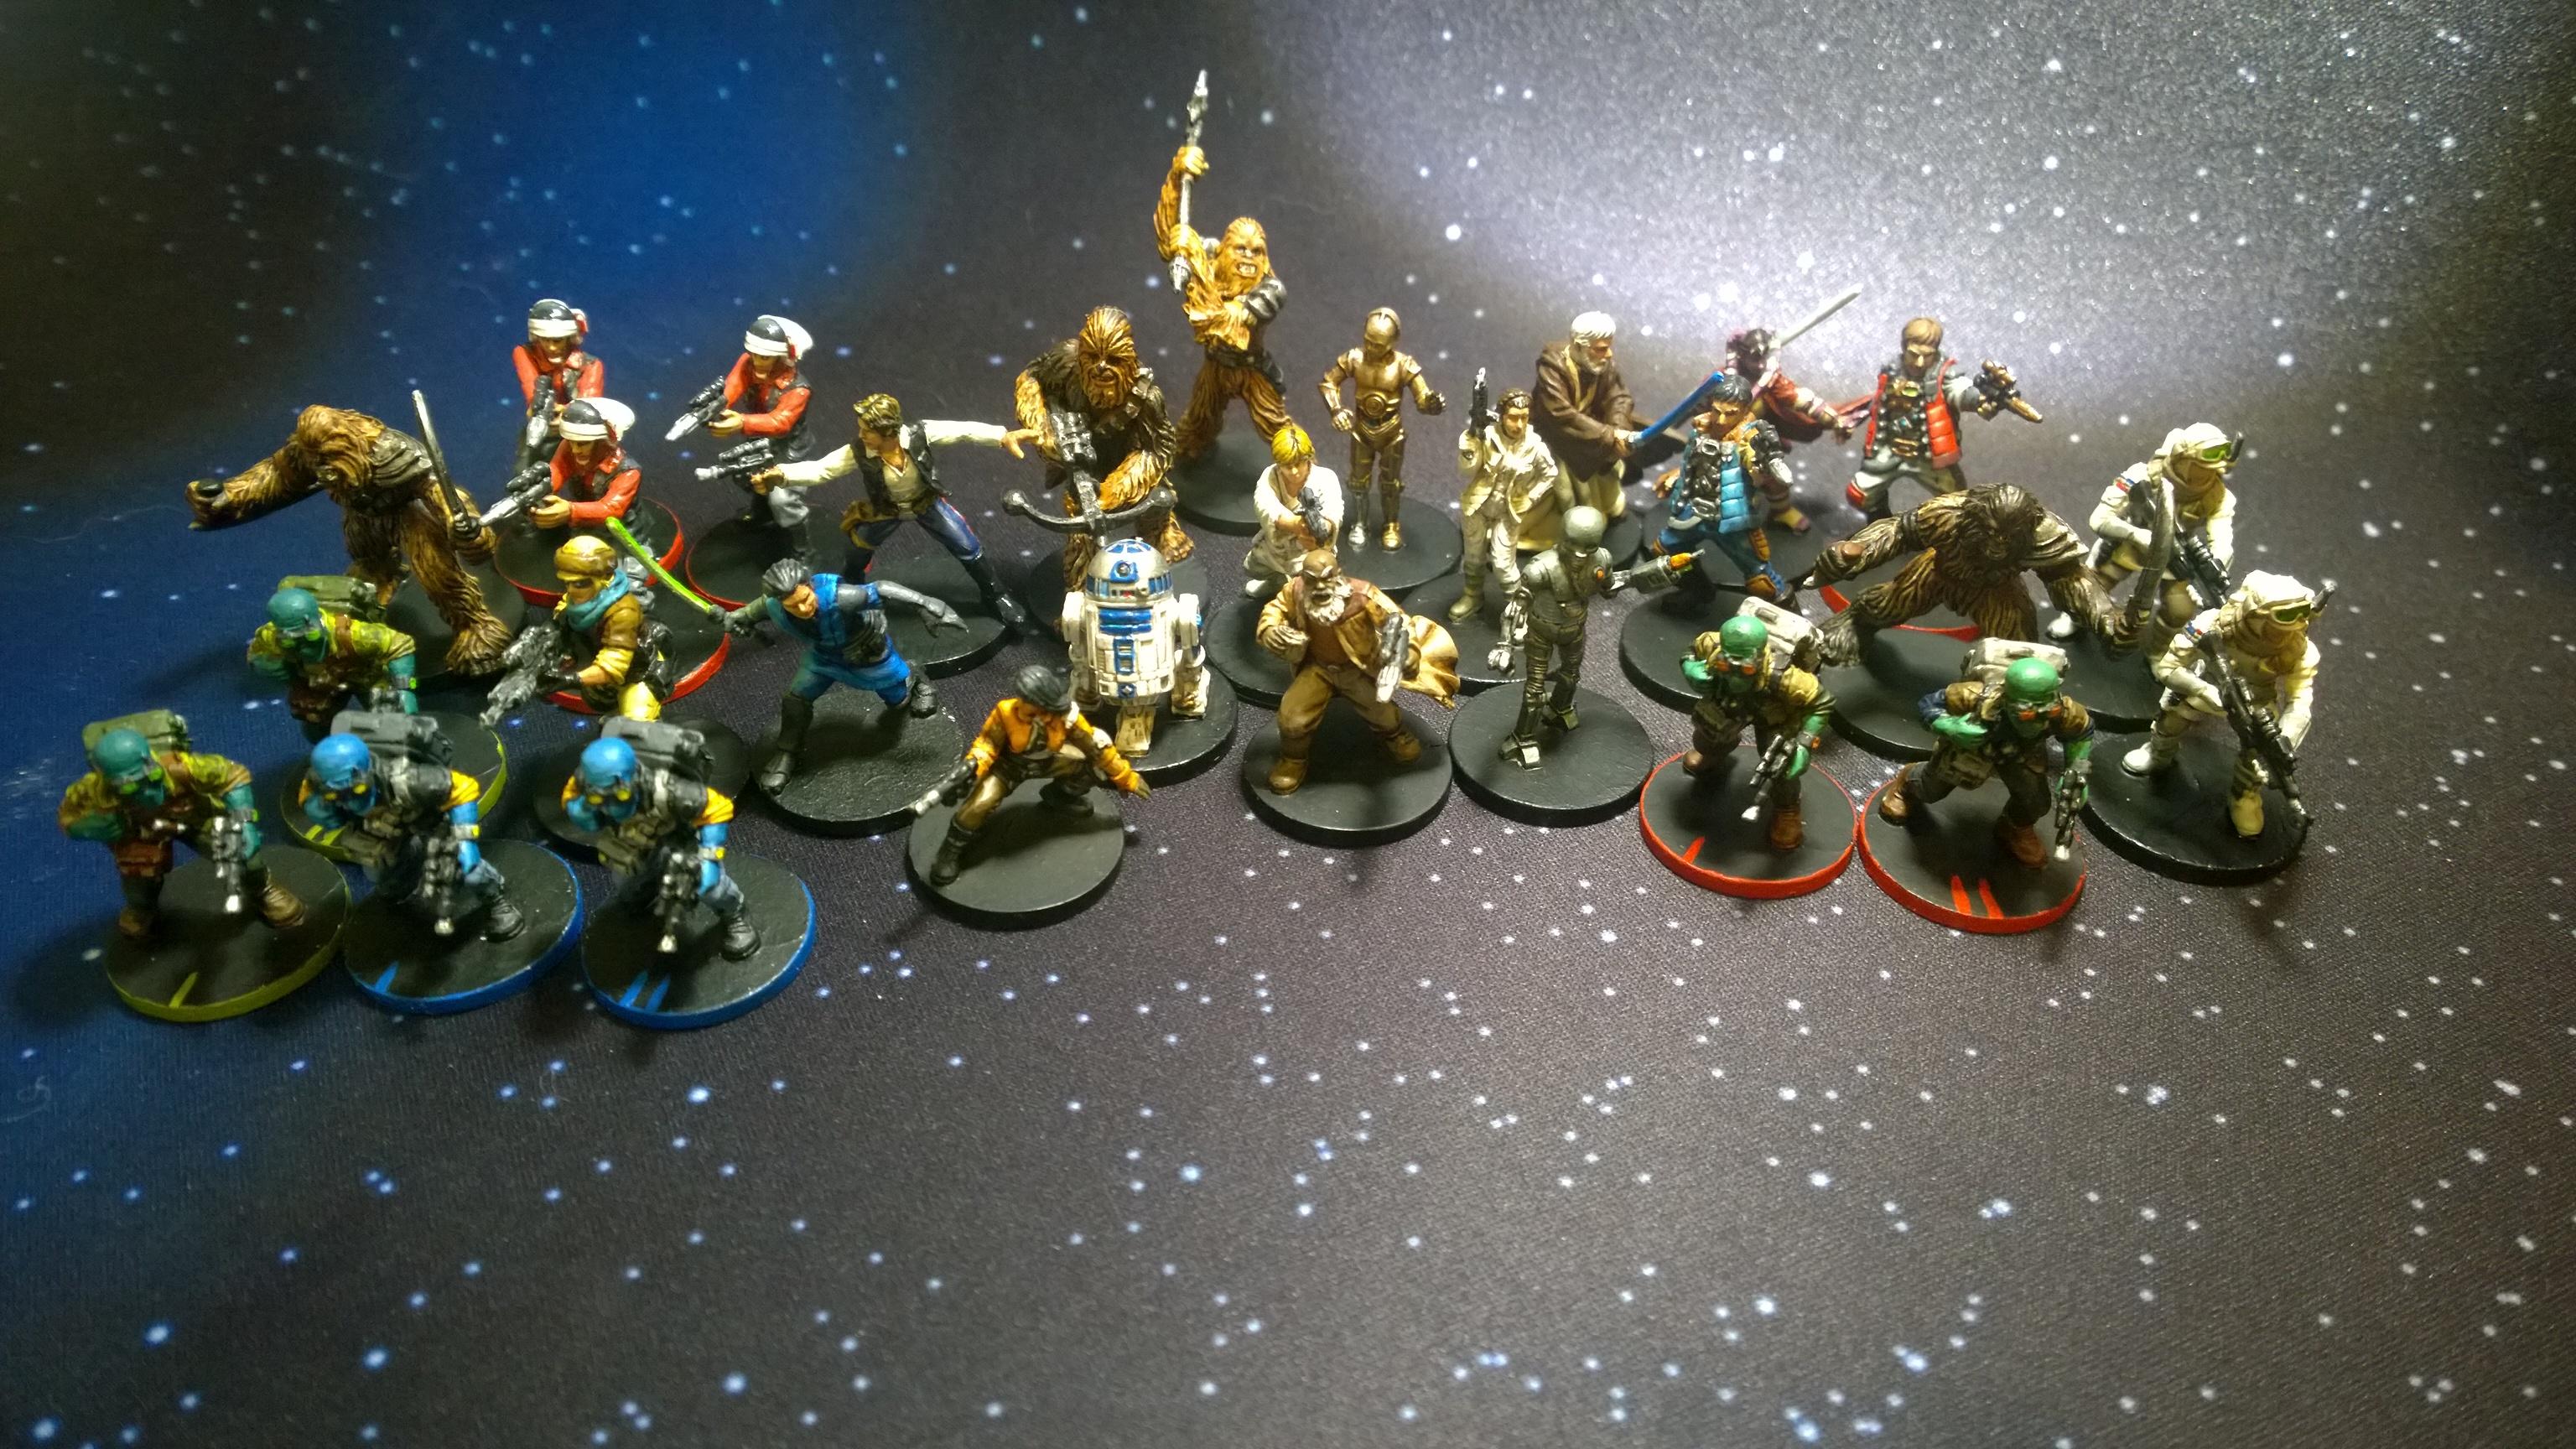 Joe's Imperial Assault Painting: Part 3